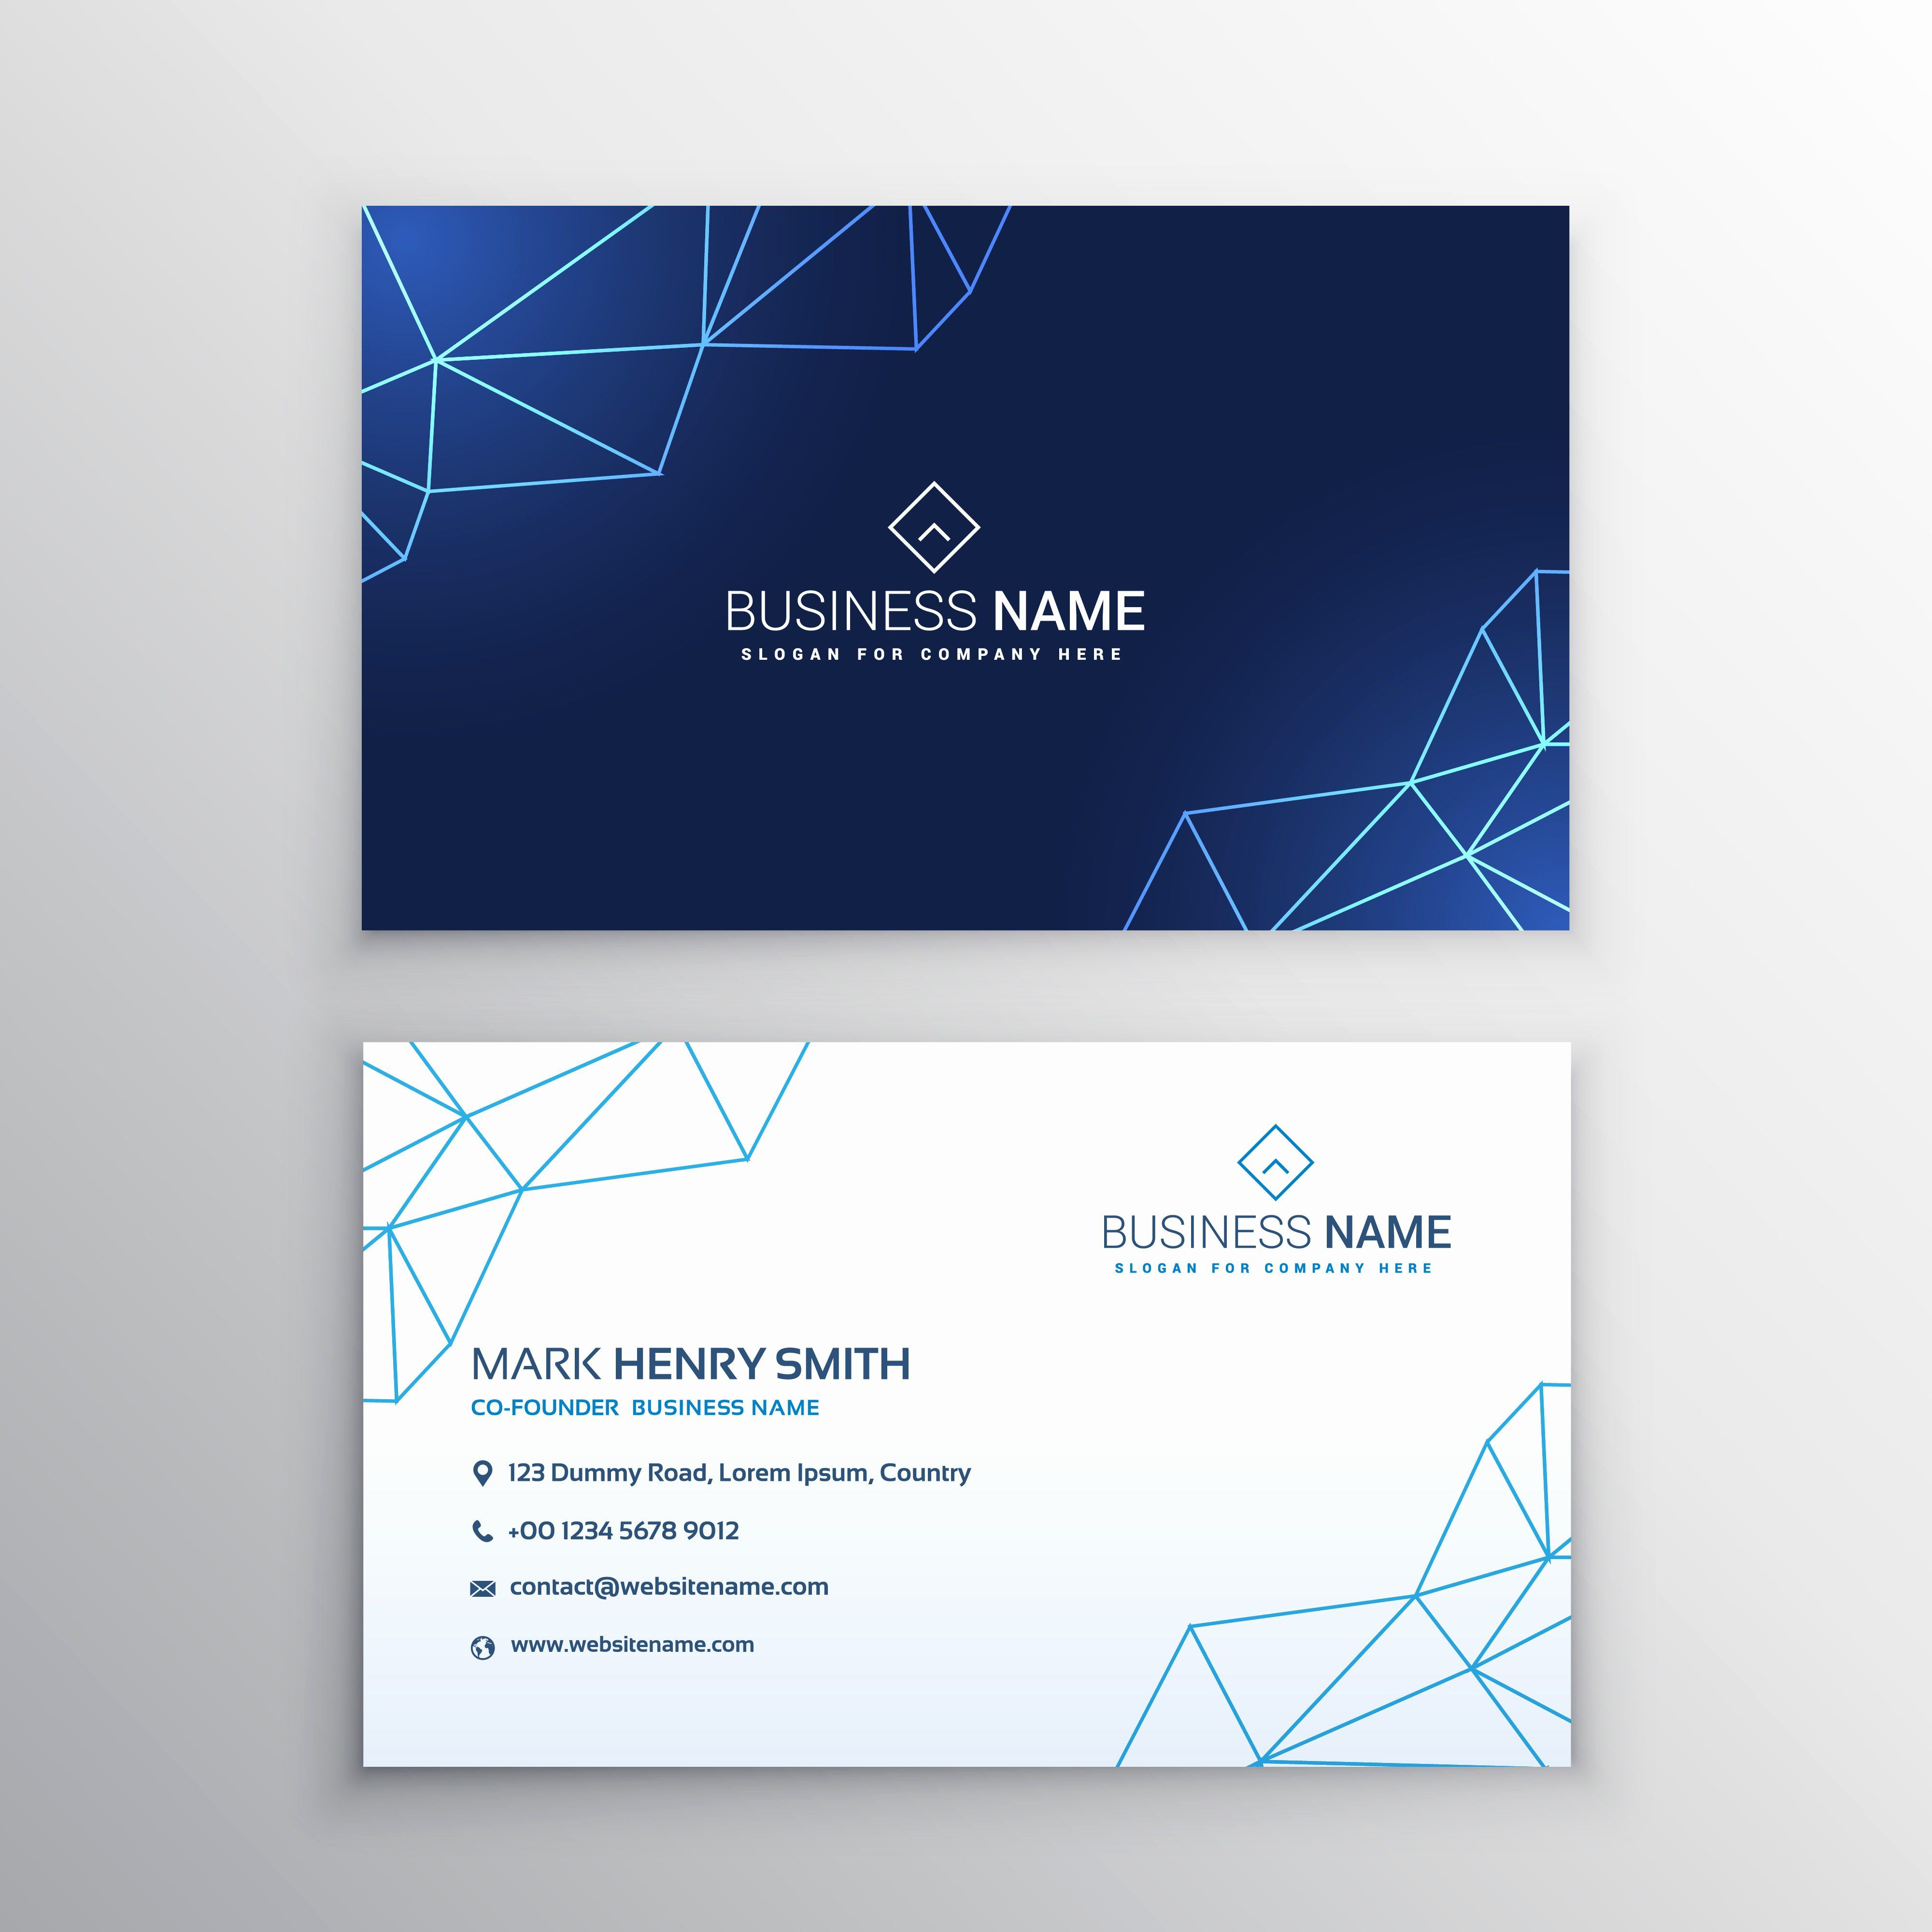 Business Card Template Vector Fresh Technology Business Card Design Template Downlo Design Business Card Ideas Download Business Card Business Card Inspiration